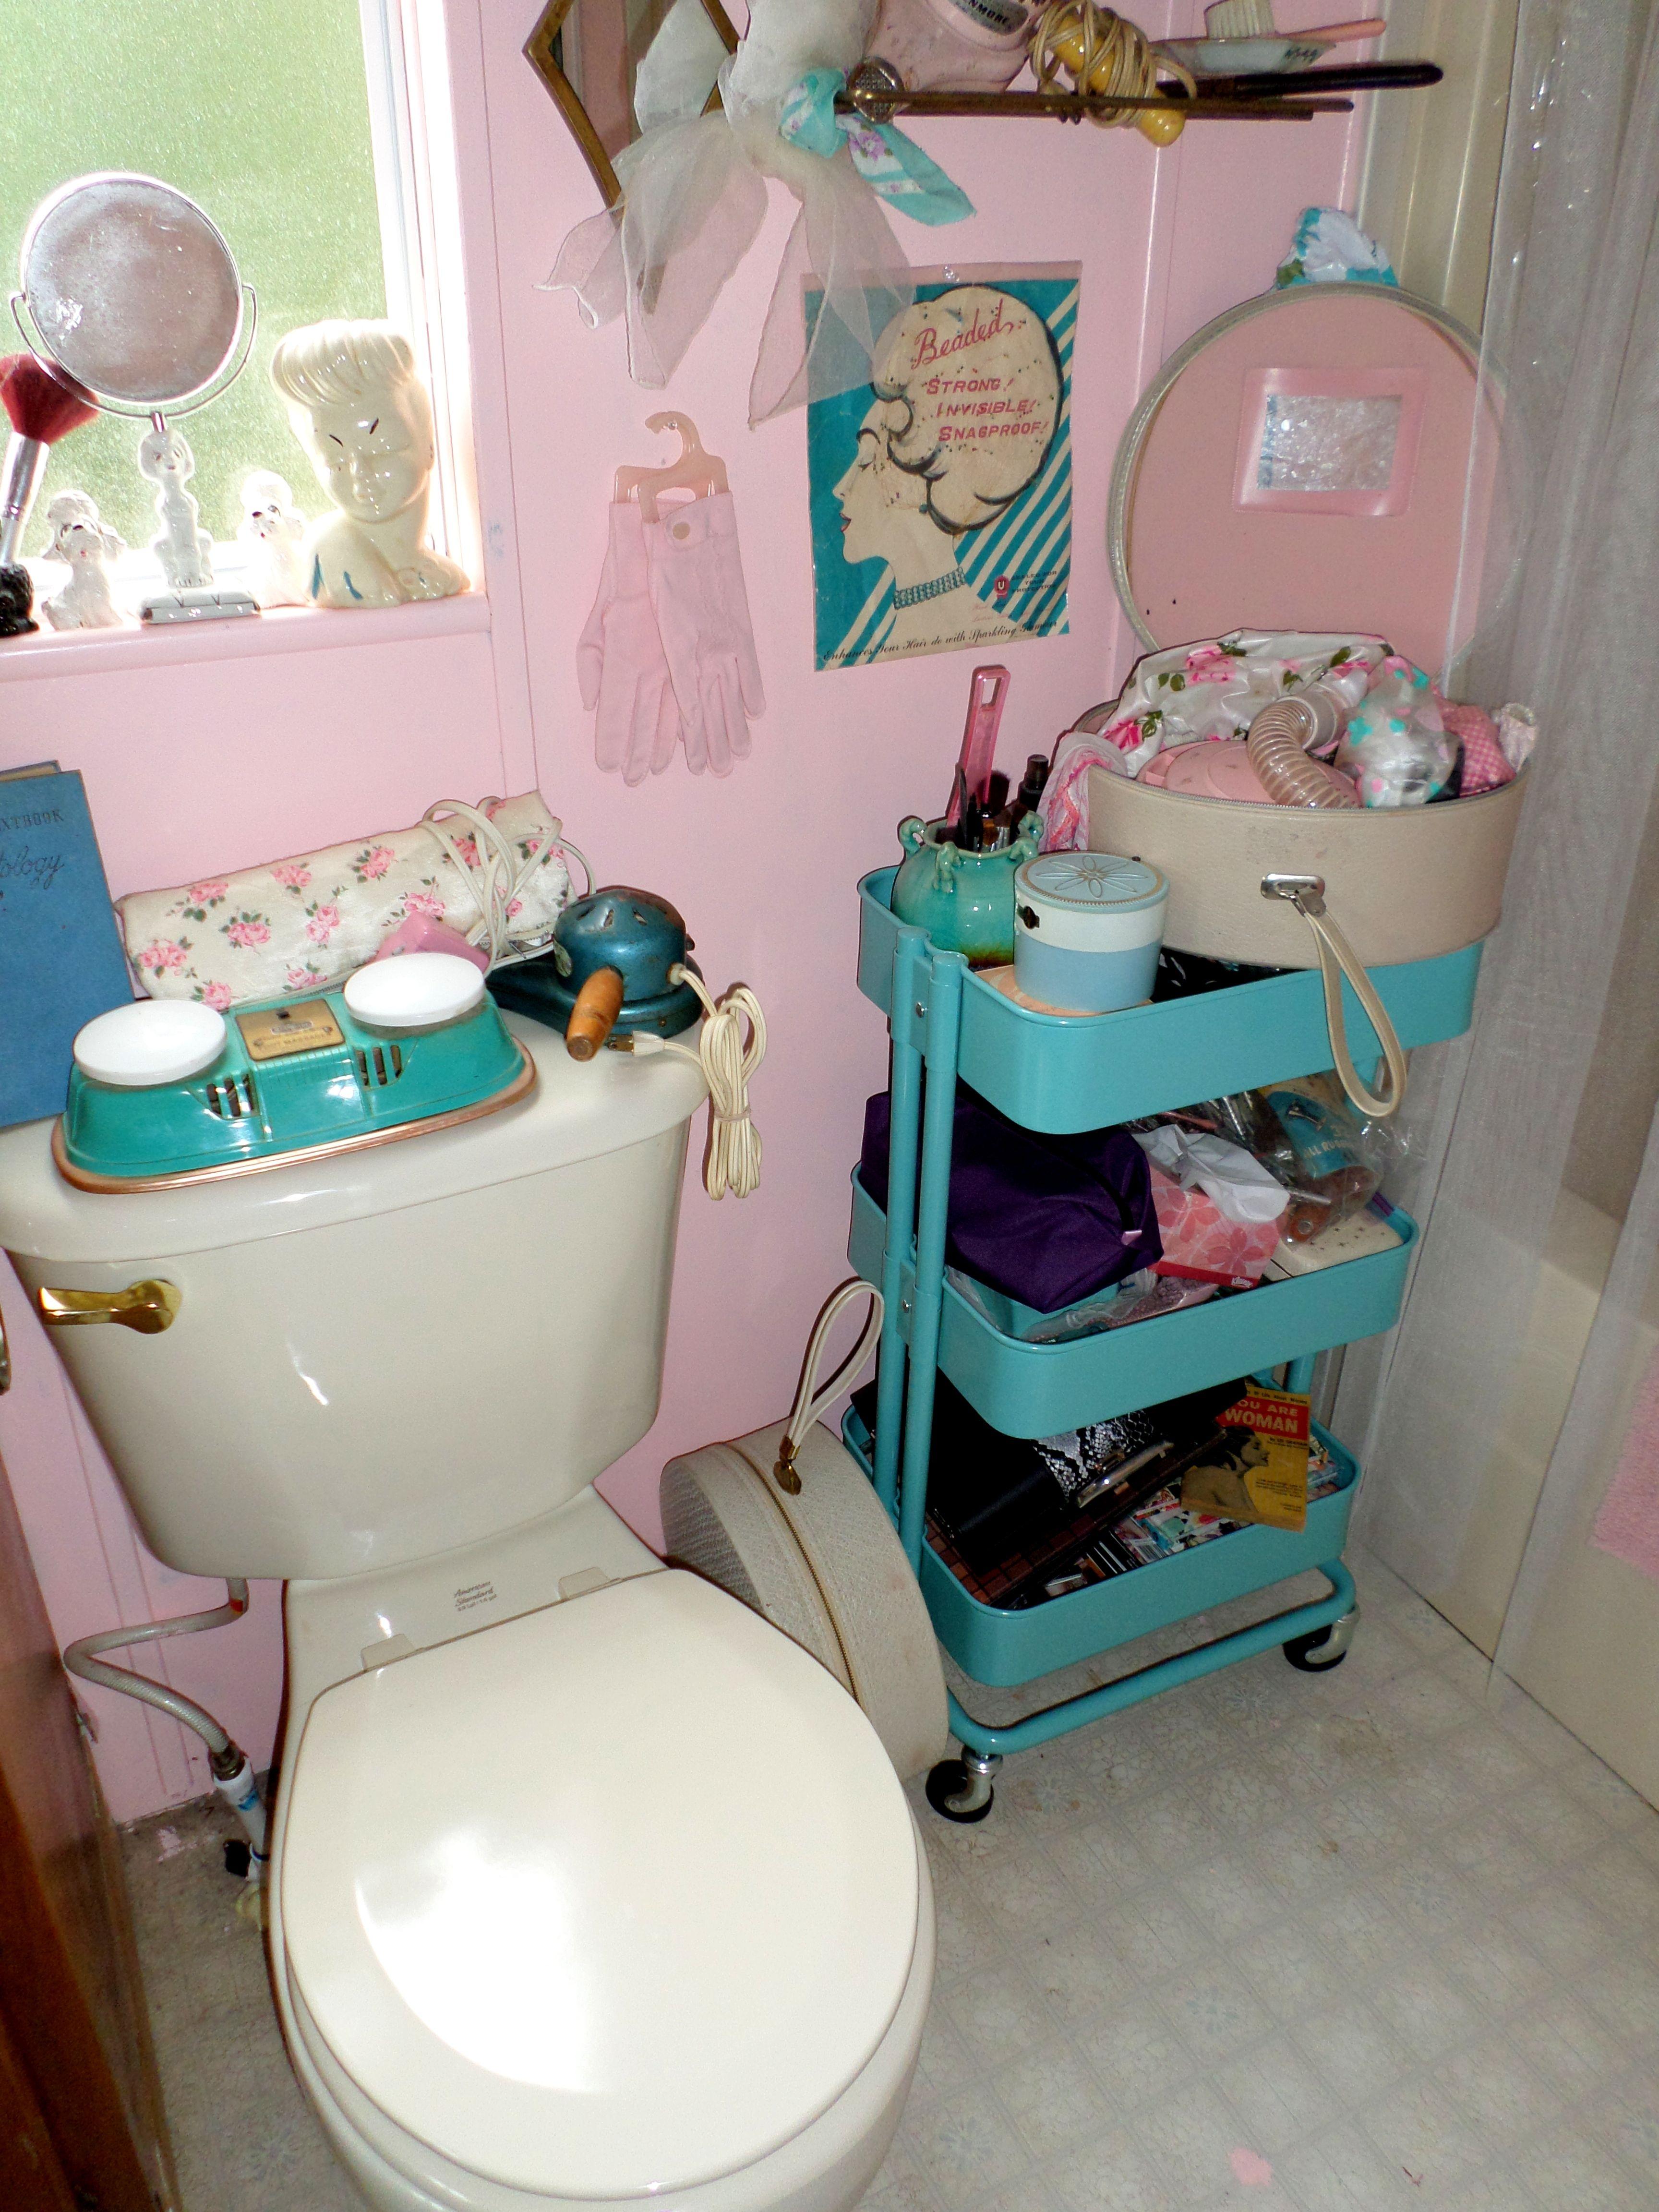 My Ultra Y Master Bathroom Tags Pink Teal Aqua Poodles Vintage Retro Pinup 50s Feminine Powder Room New Home